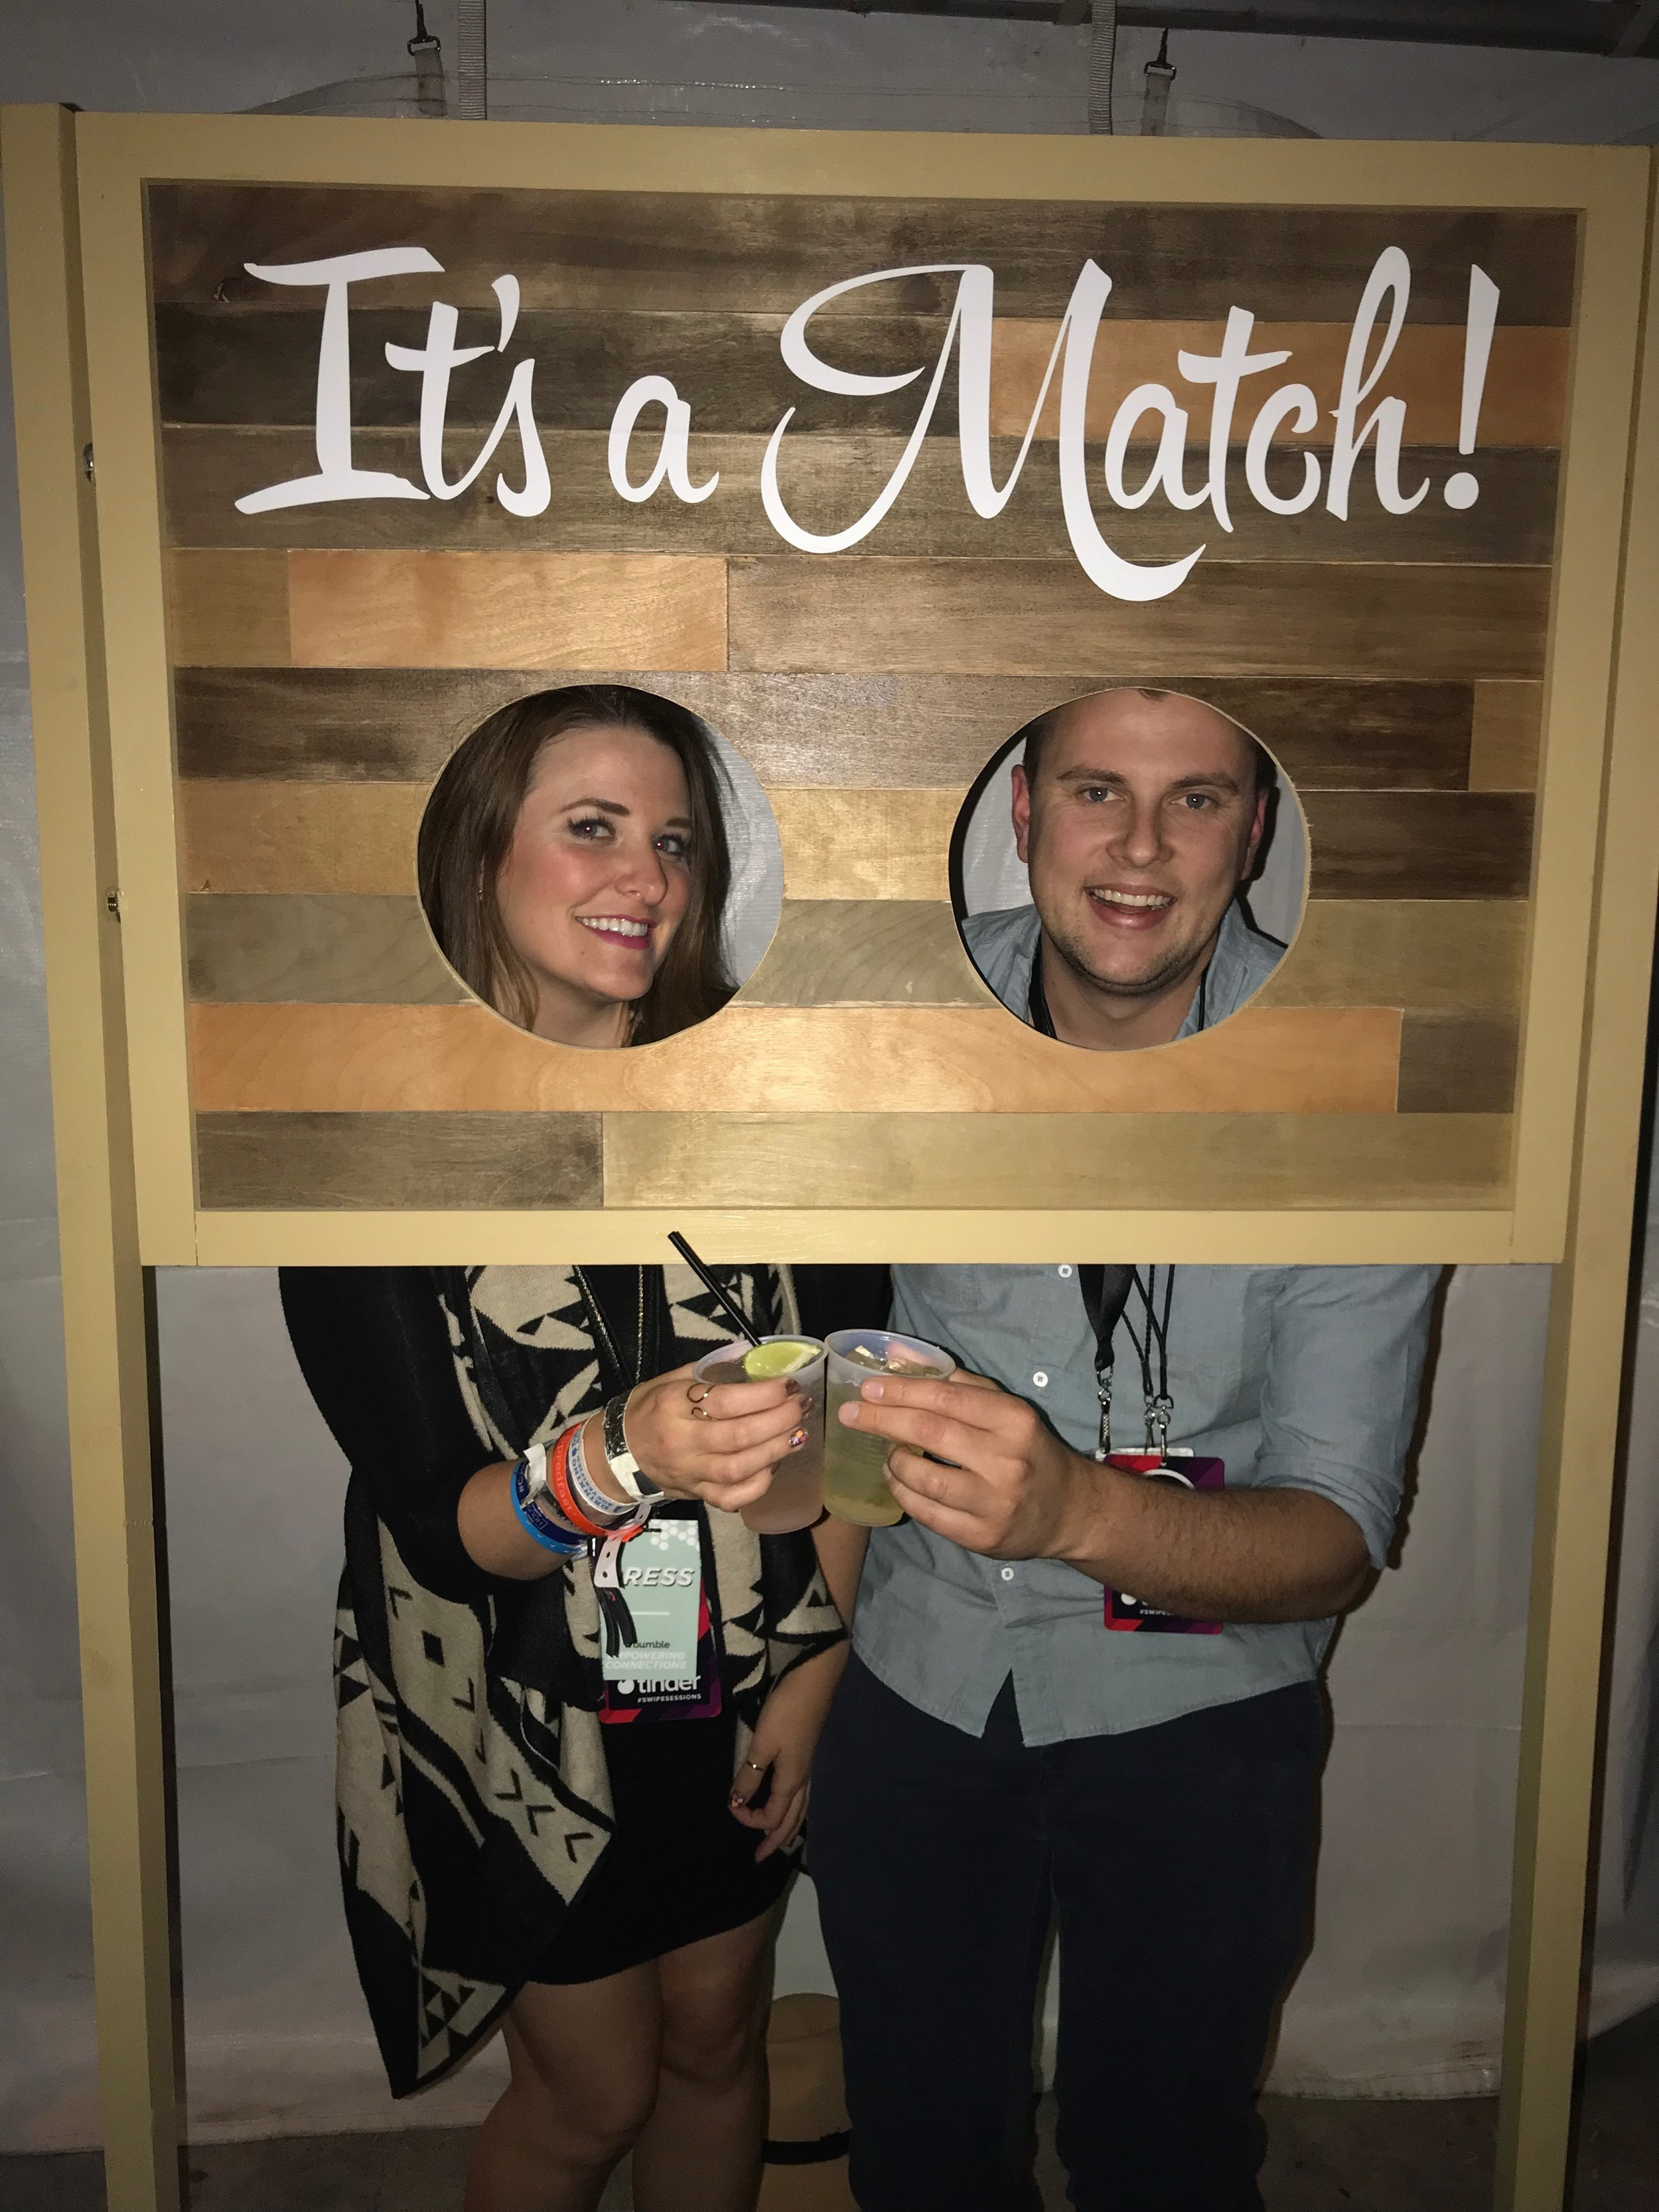 Tinder at SXSW | coupleinthekitchen.com